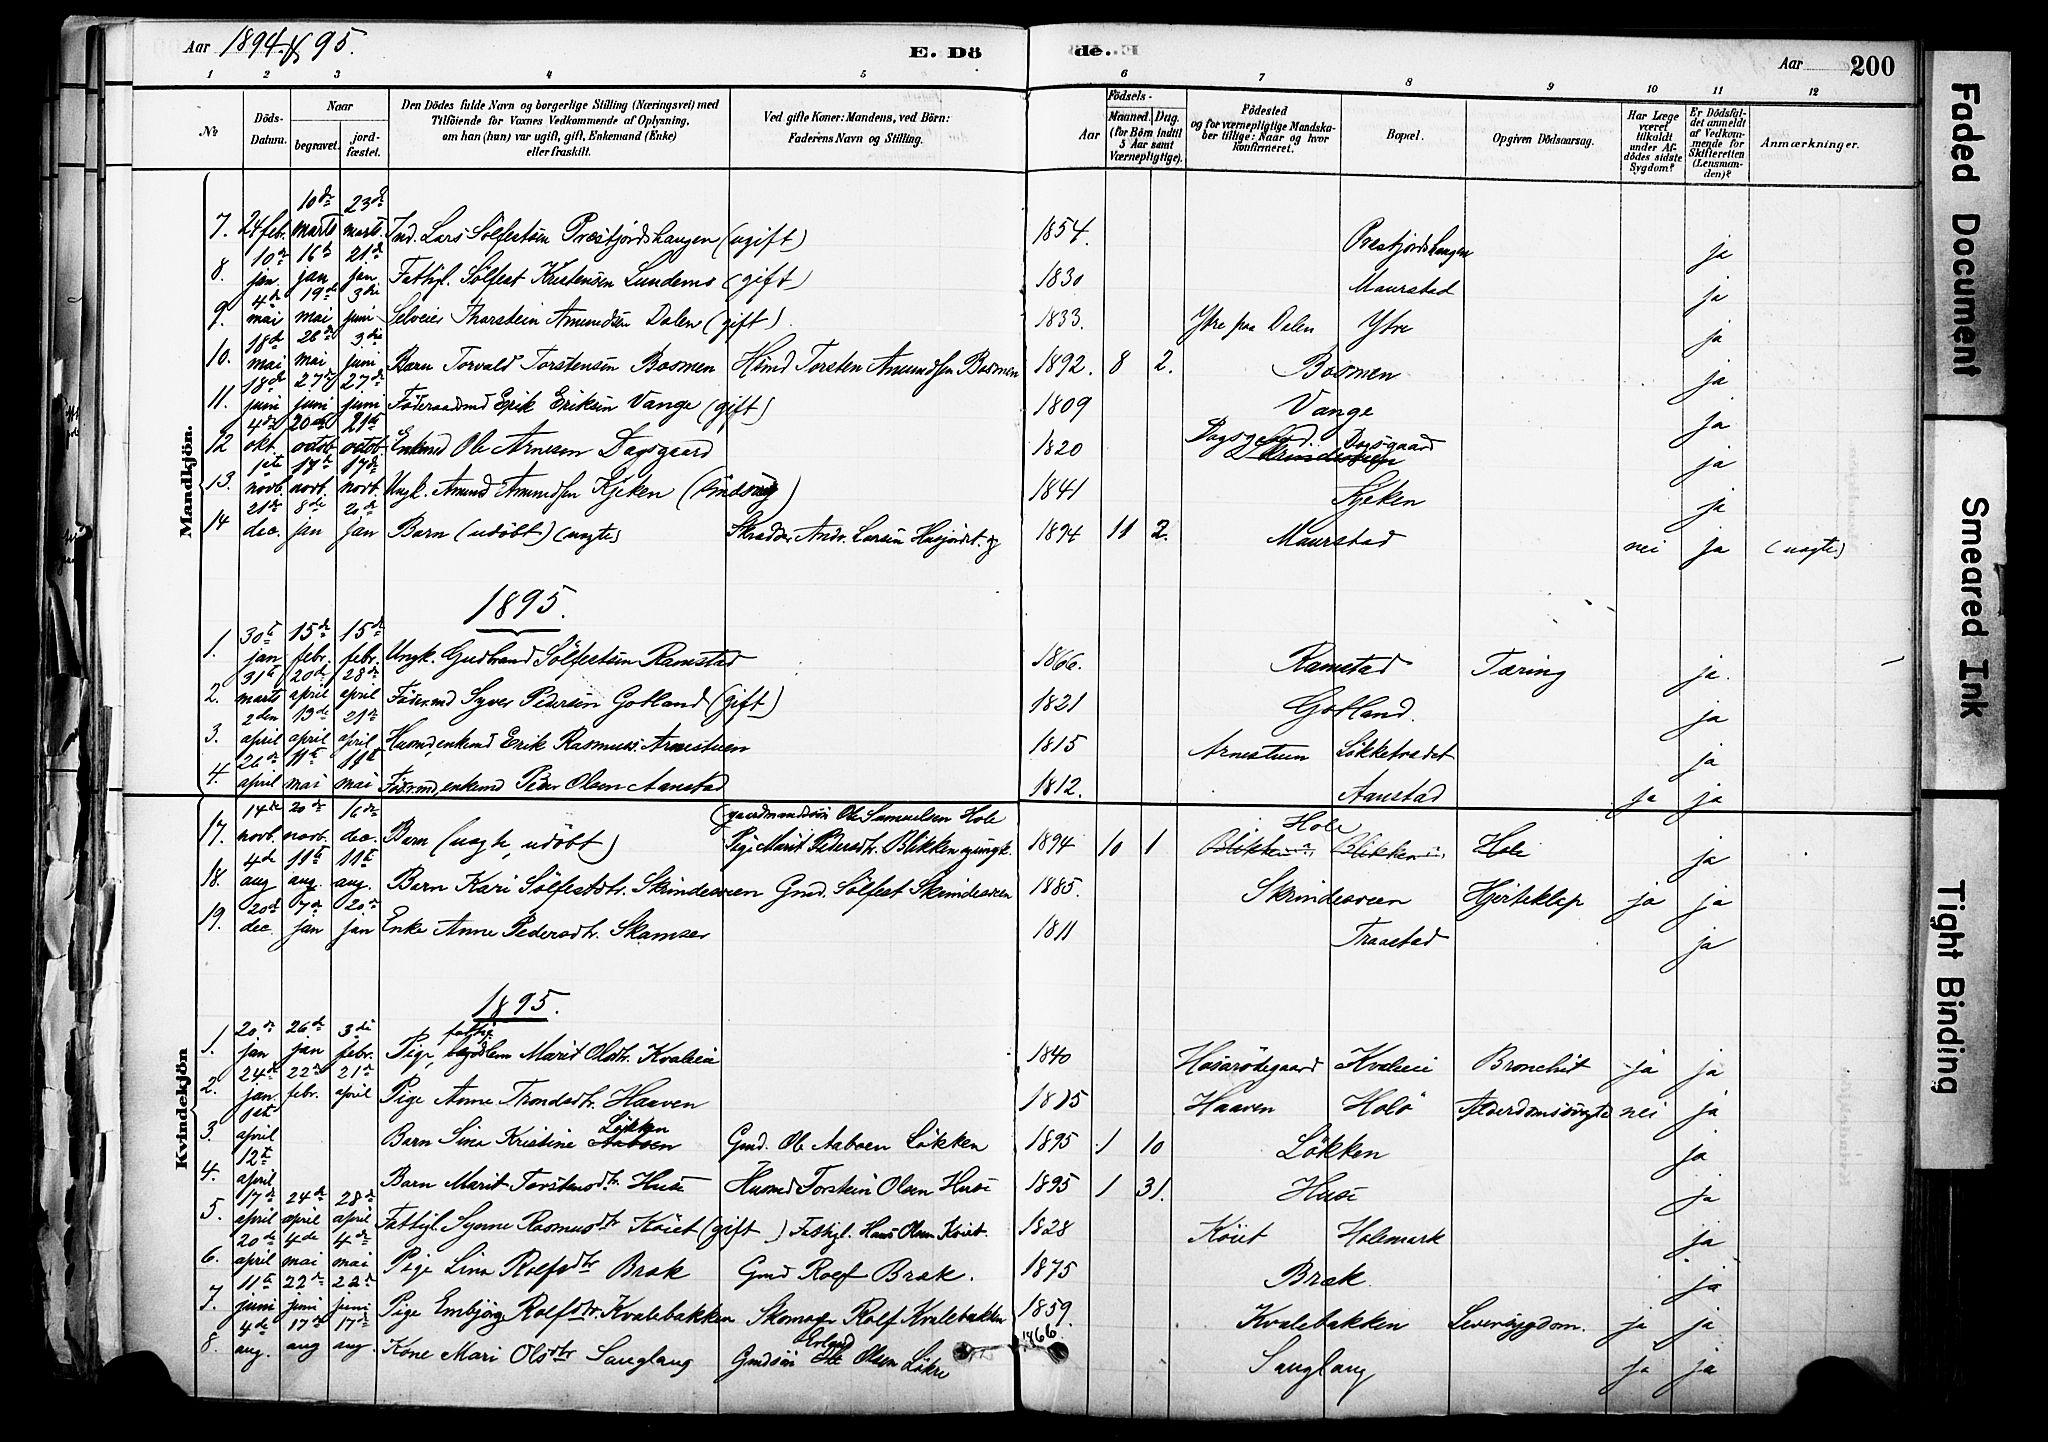 SAH, Skjåk prestekontor, Ministerialbok nr. 3, 1880-1907, s. 200